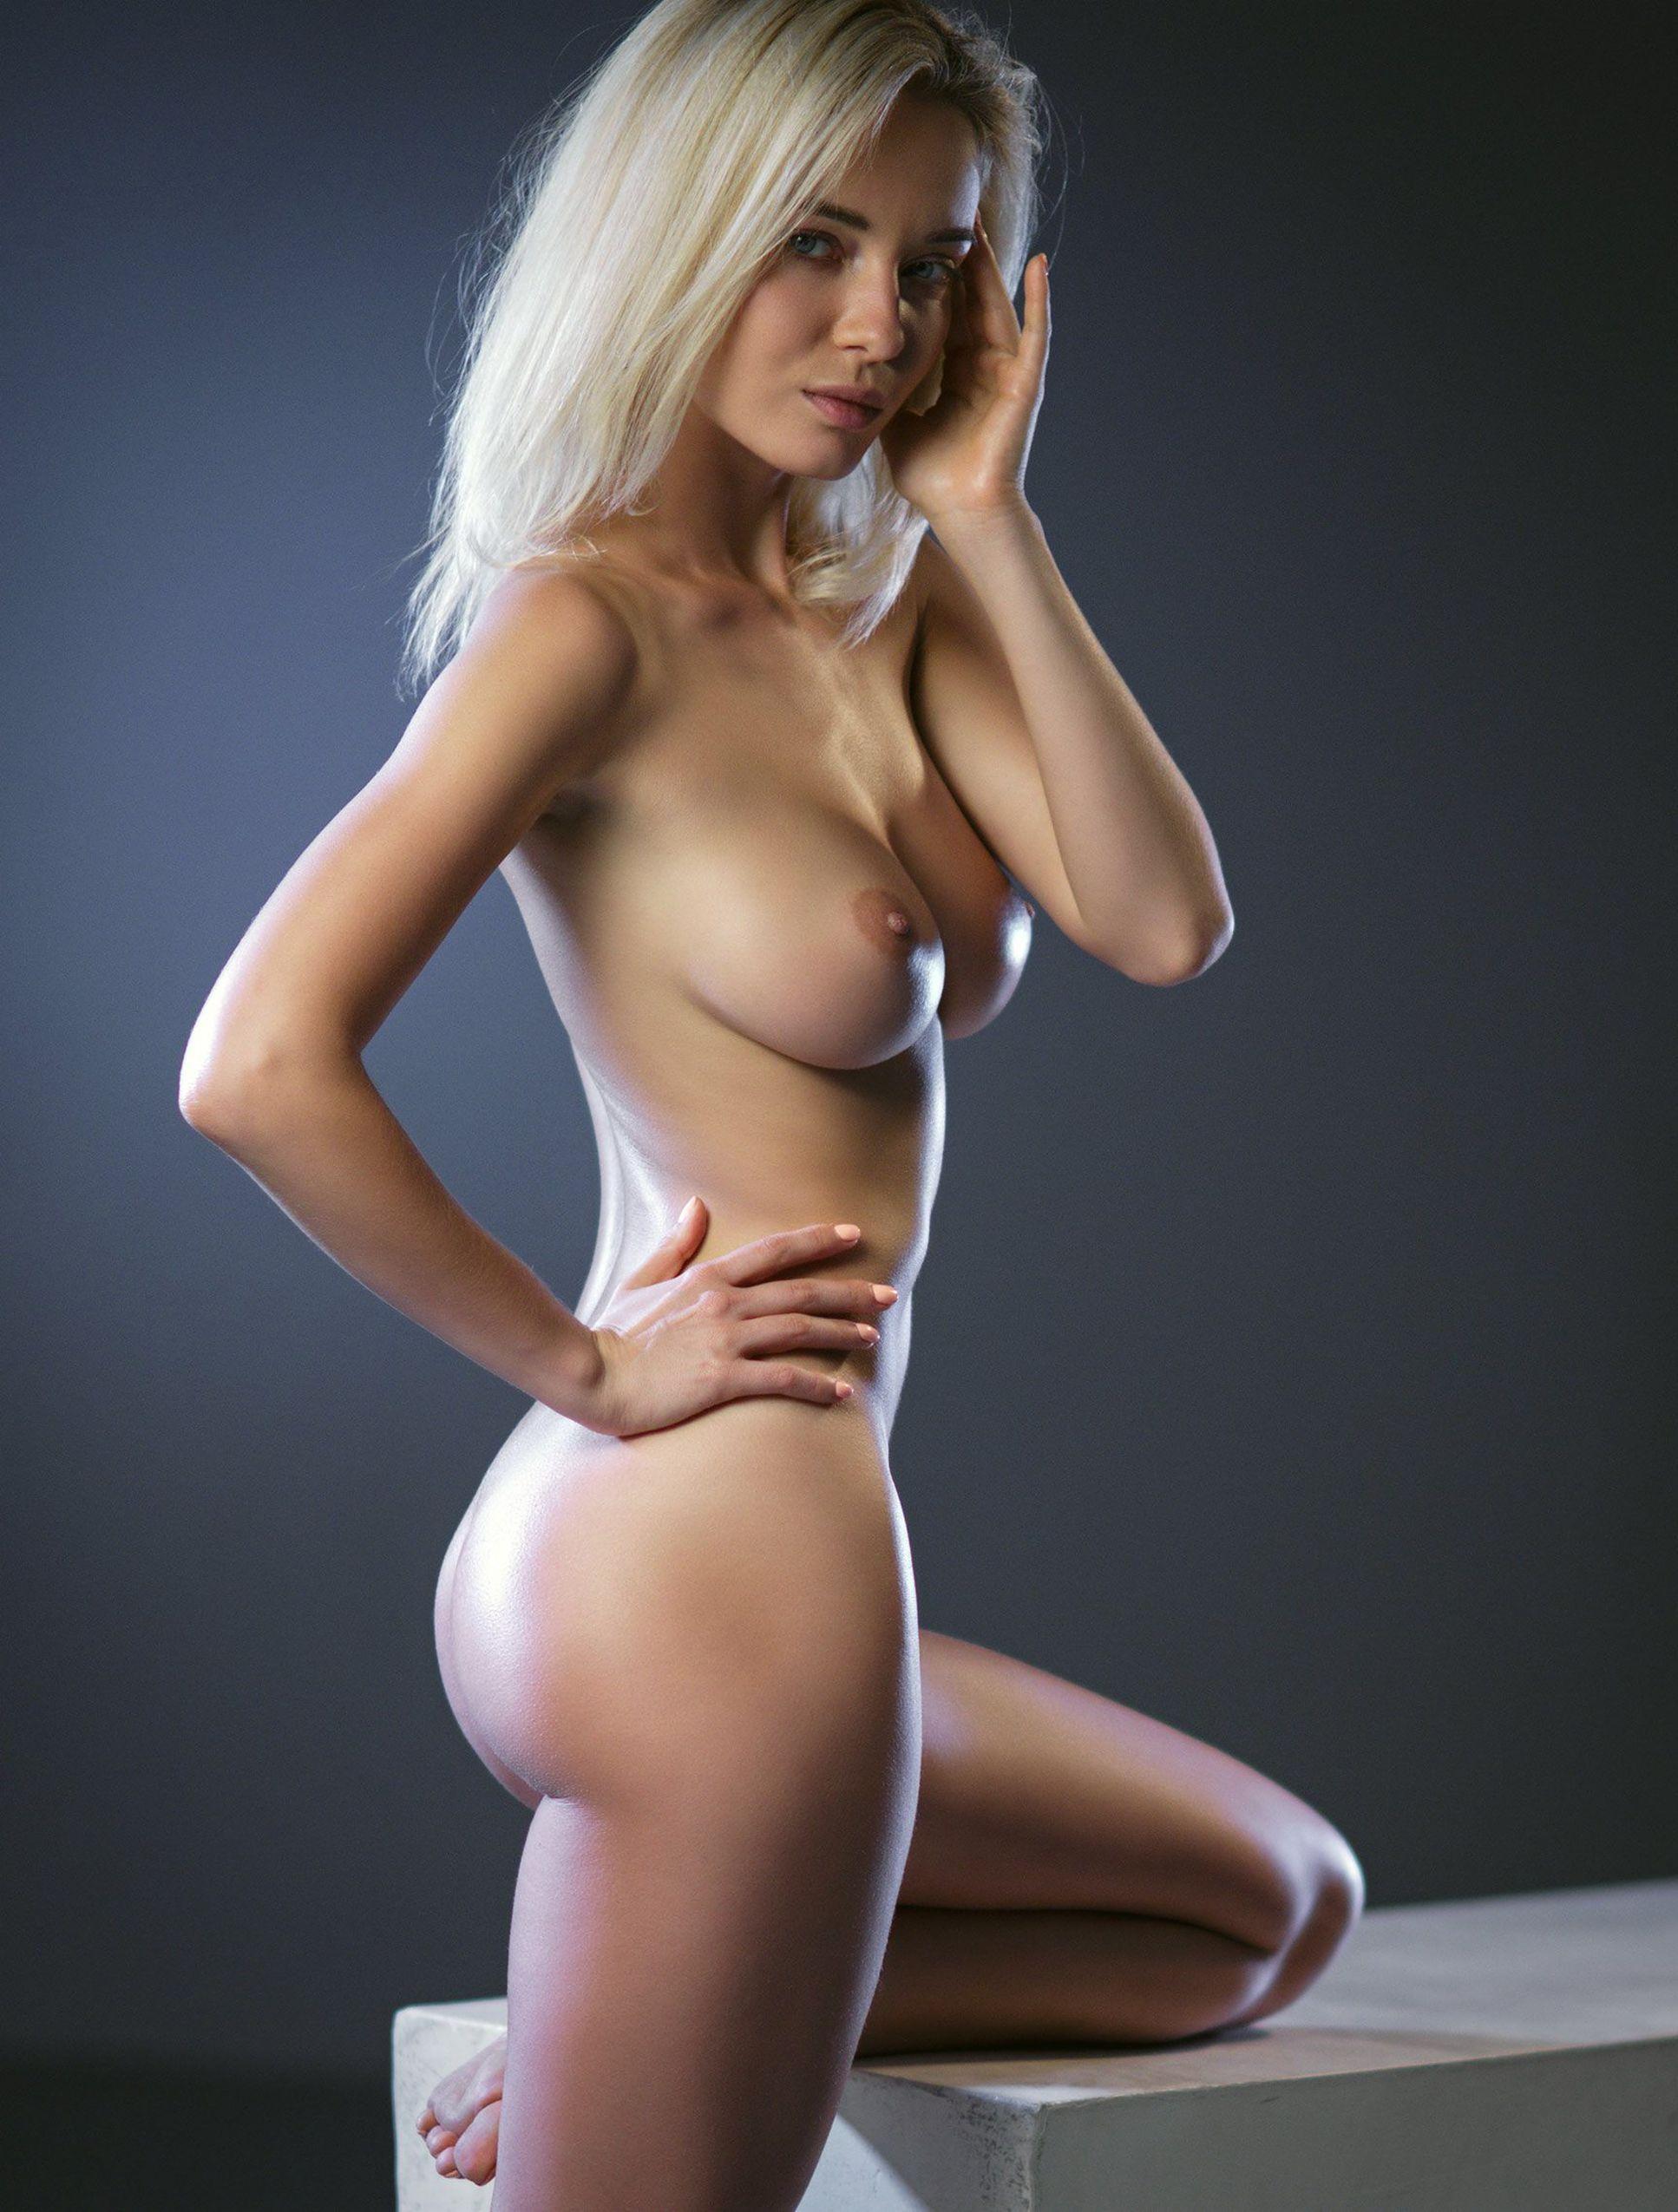 Andreewa porn natalja Natalia Andreeva's